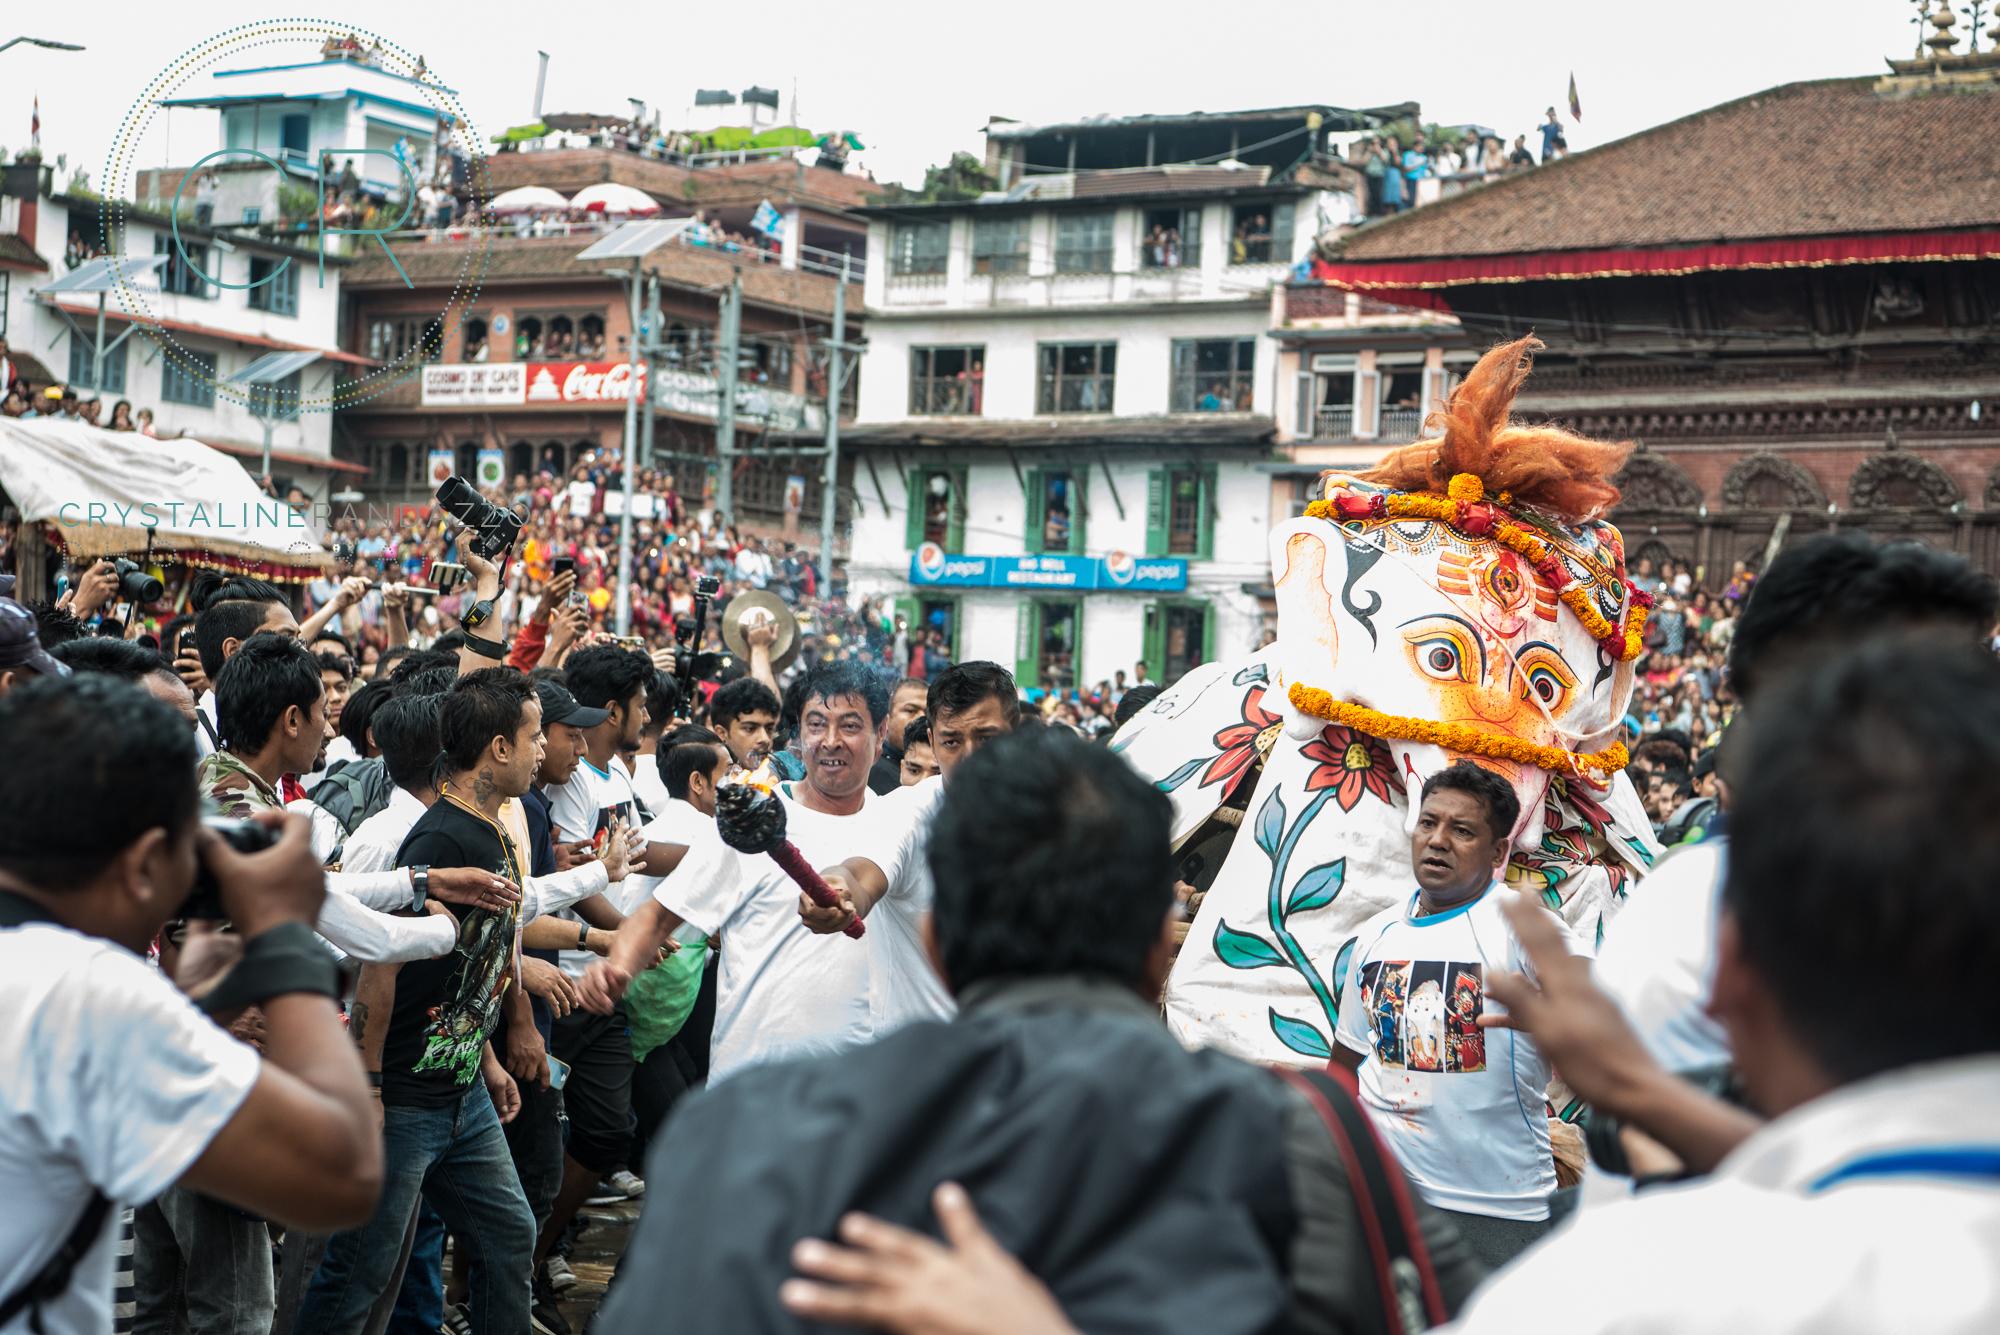 Randazzo_Kathmanduwanderings_20170905_00213.jpg